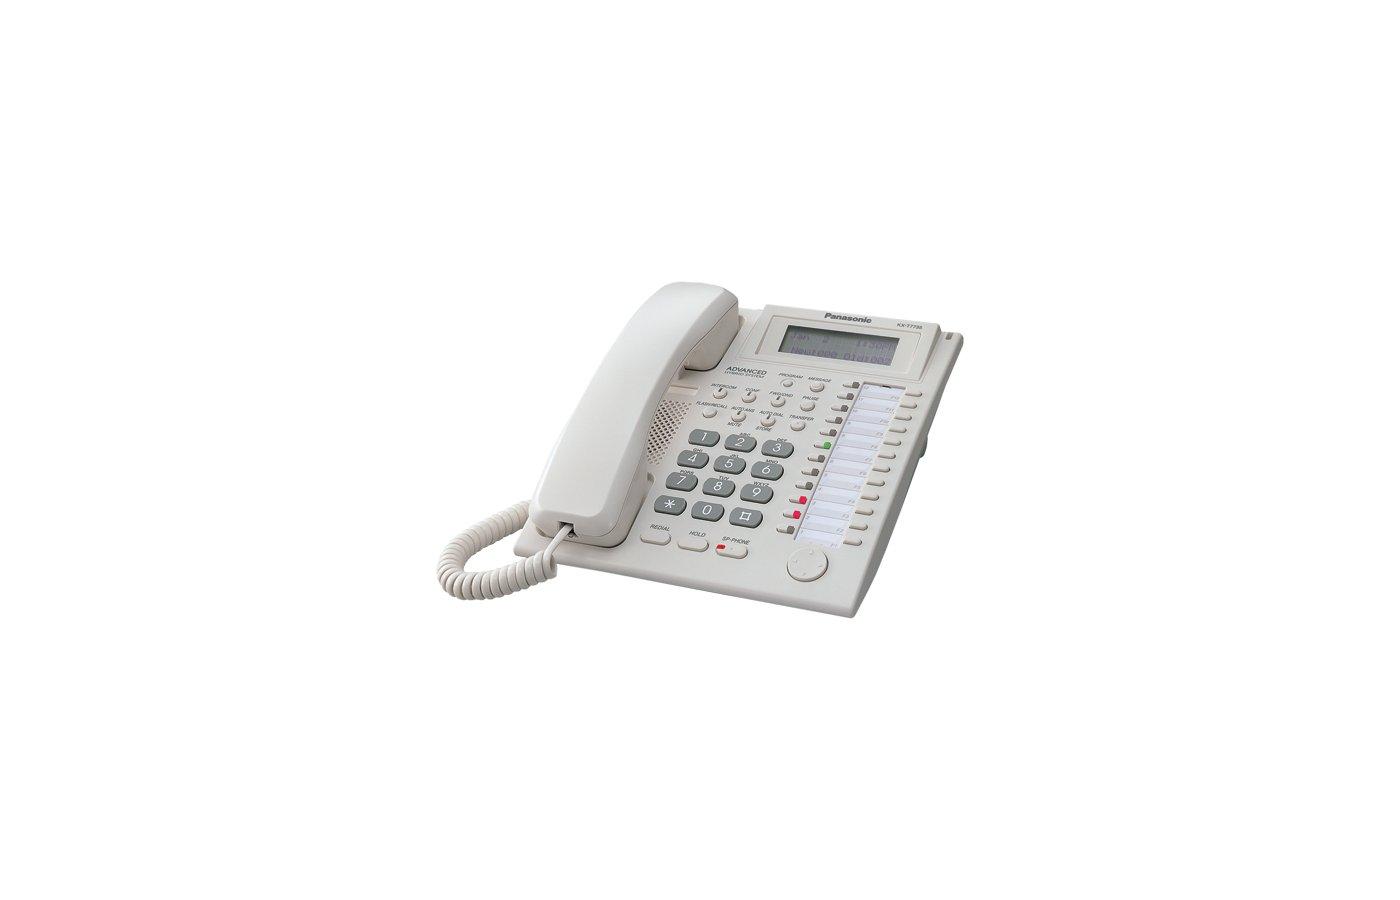 Радиотелефон PANASONIC KX-T7735RU-W